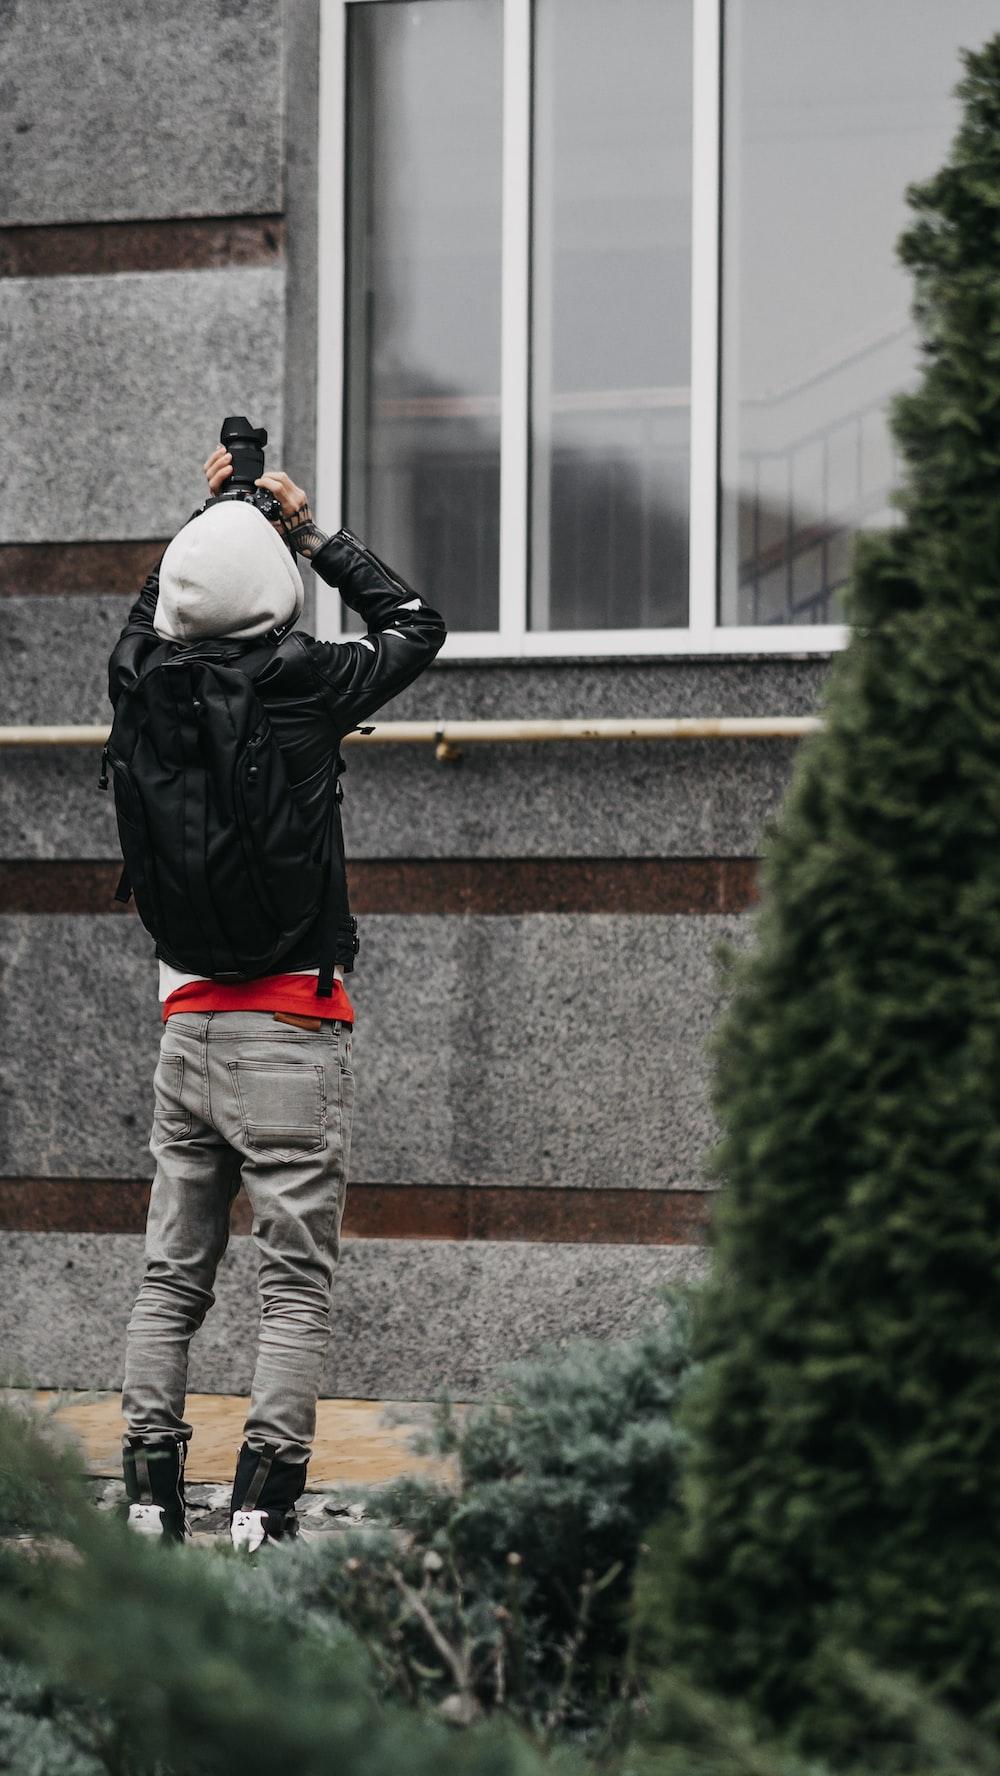 man wearing black leather jacket standing near the window